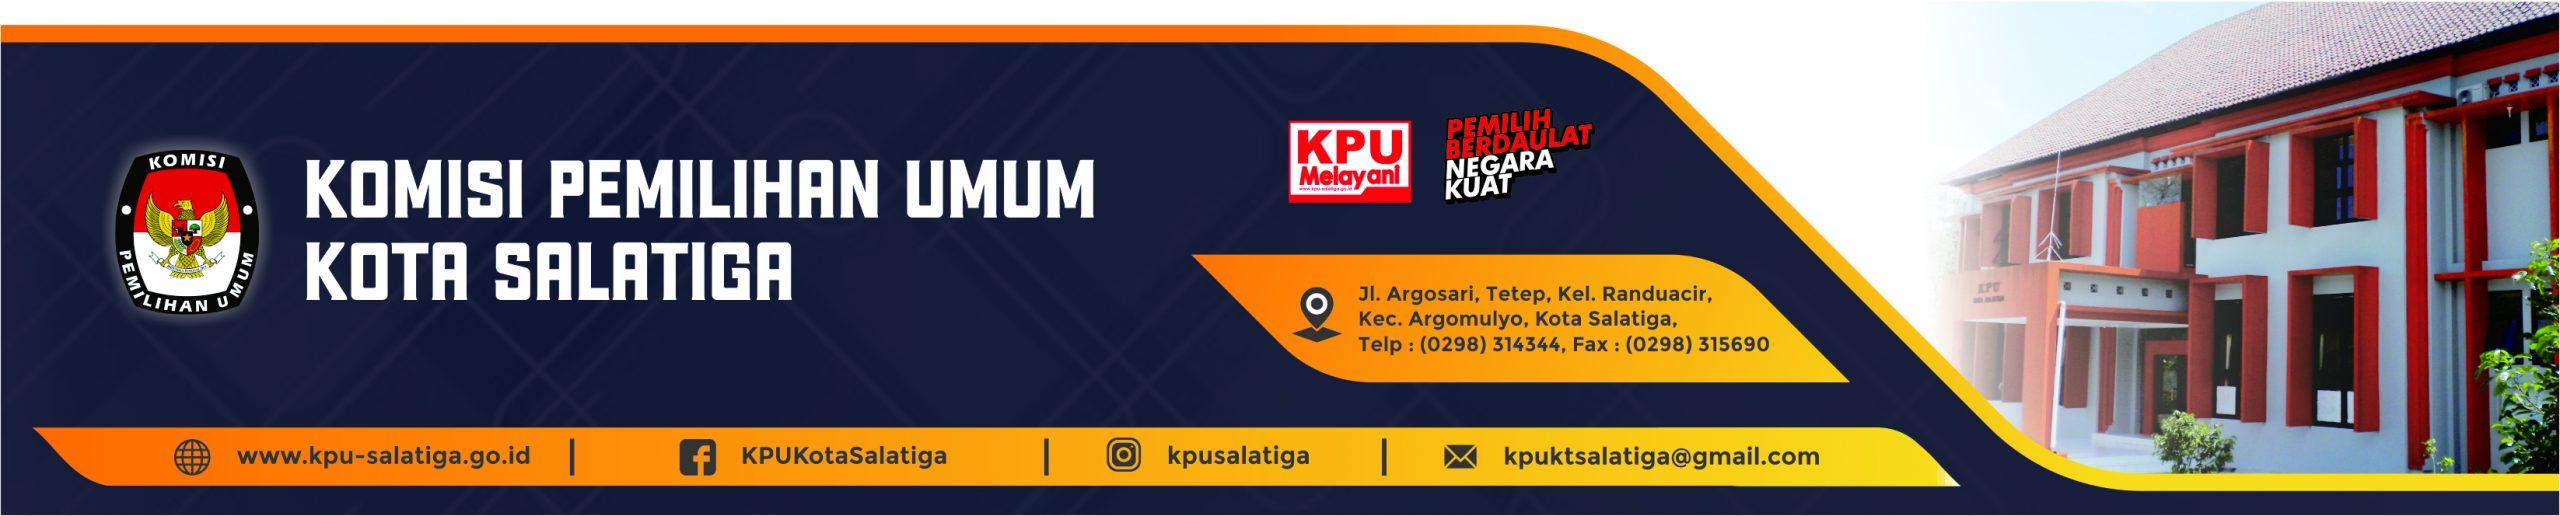 Header KPU 2